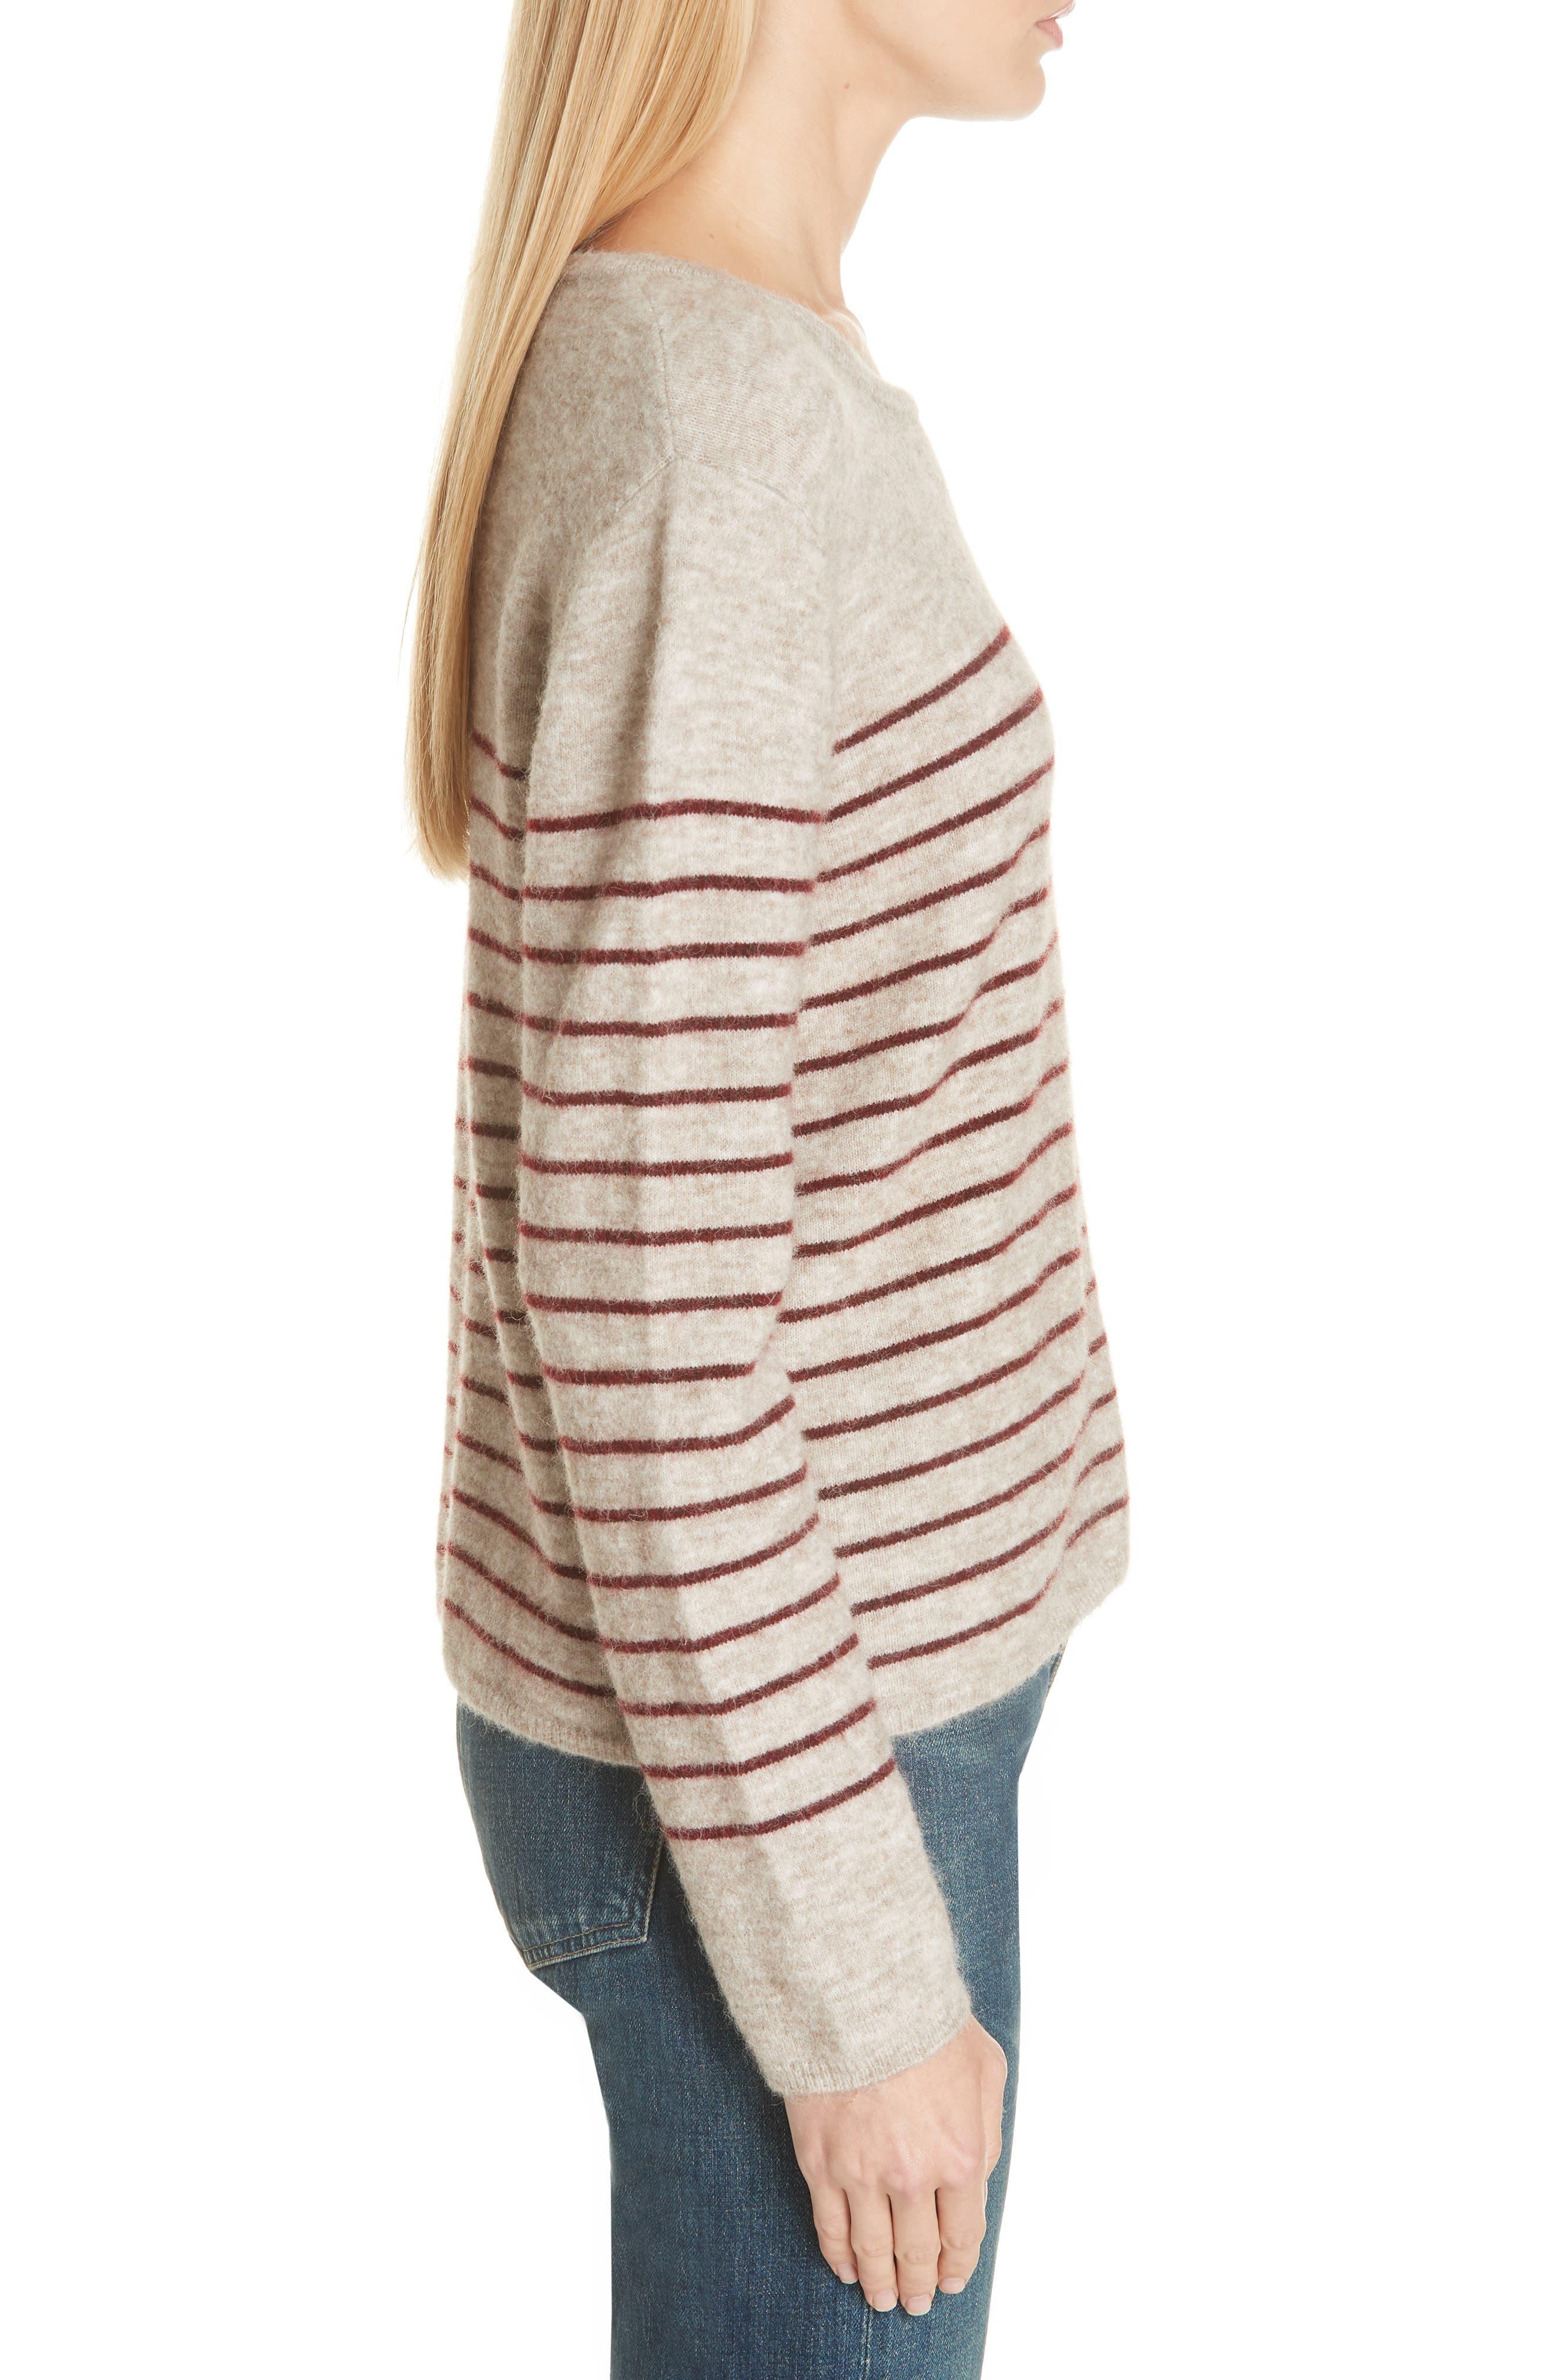 Artaud Stripe Sweater,                             Alternate thumbnail 3, color,                             BEIGE